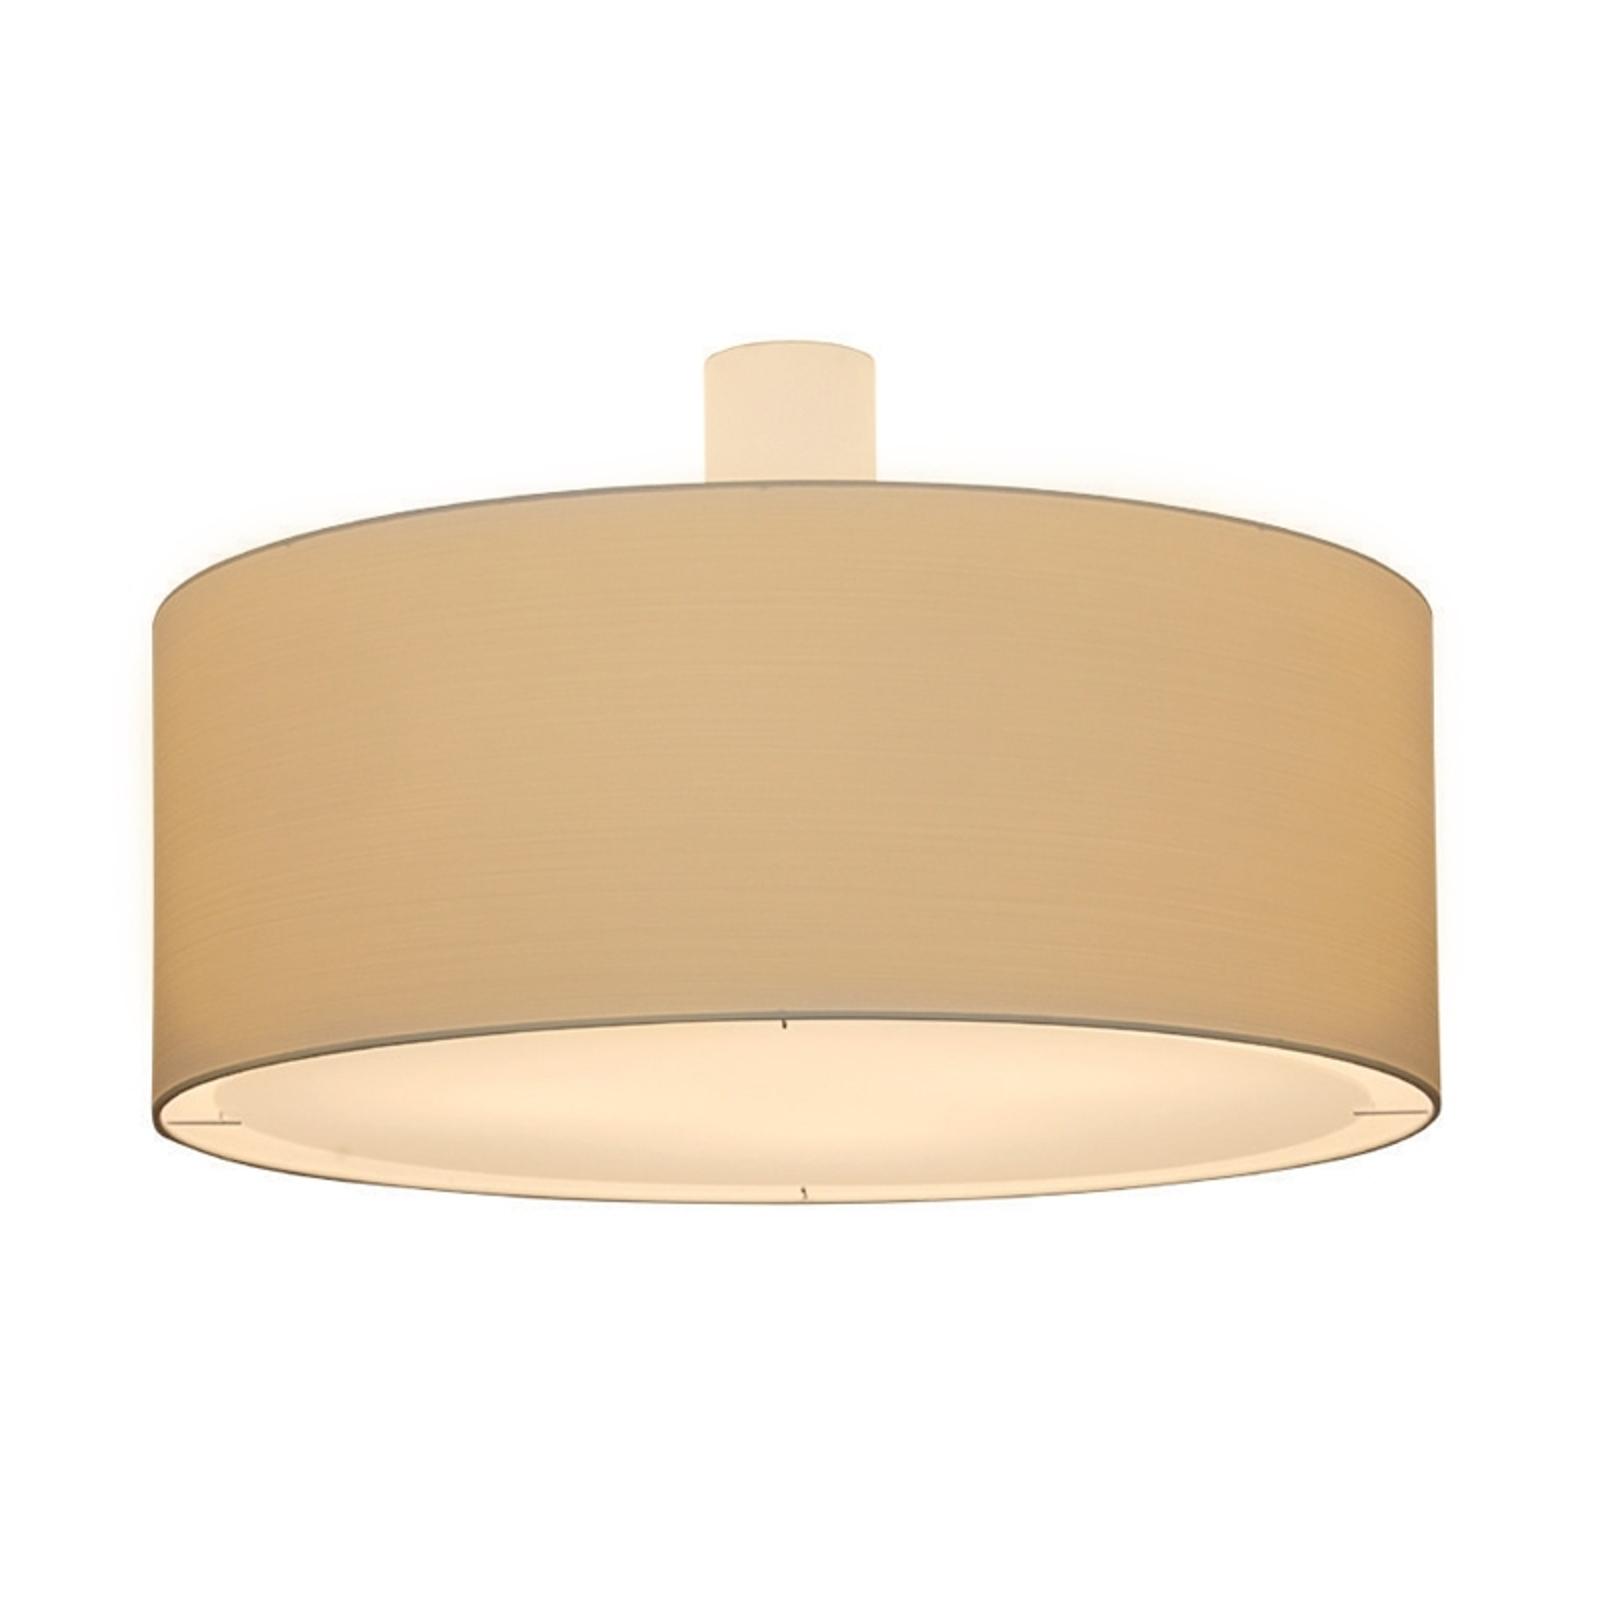 Kremowa lampa sufitowa LIVING ELEGANT średn. 80 cm